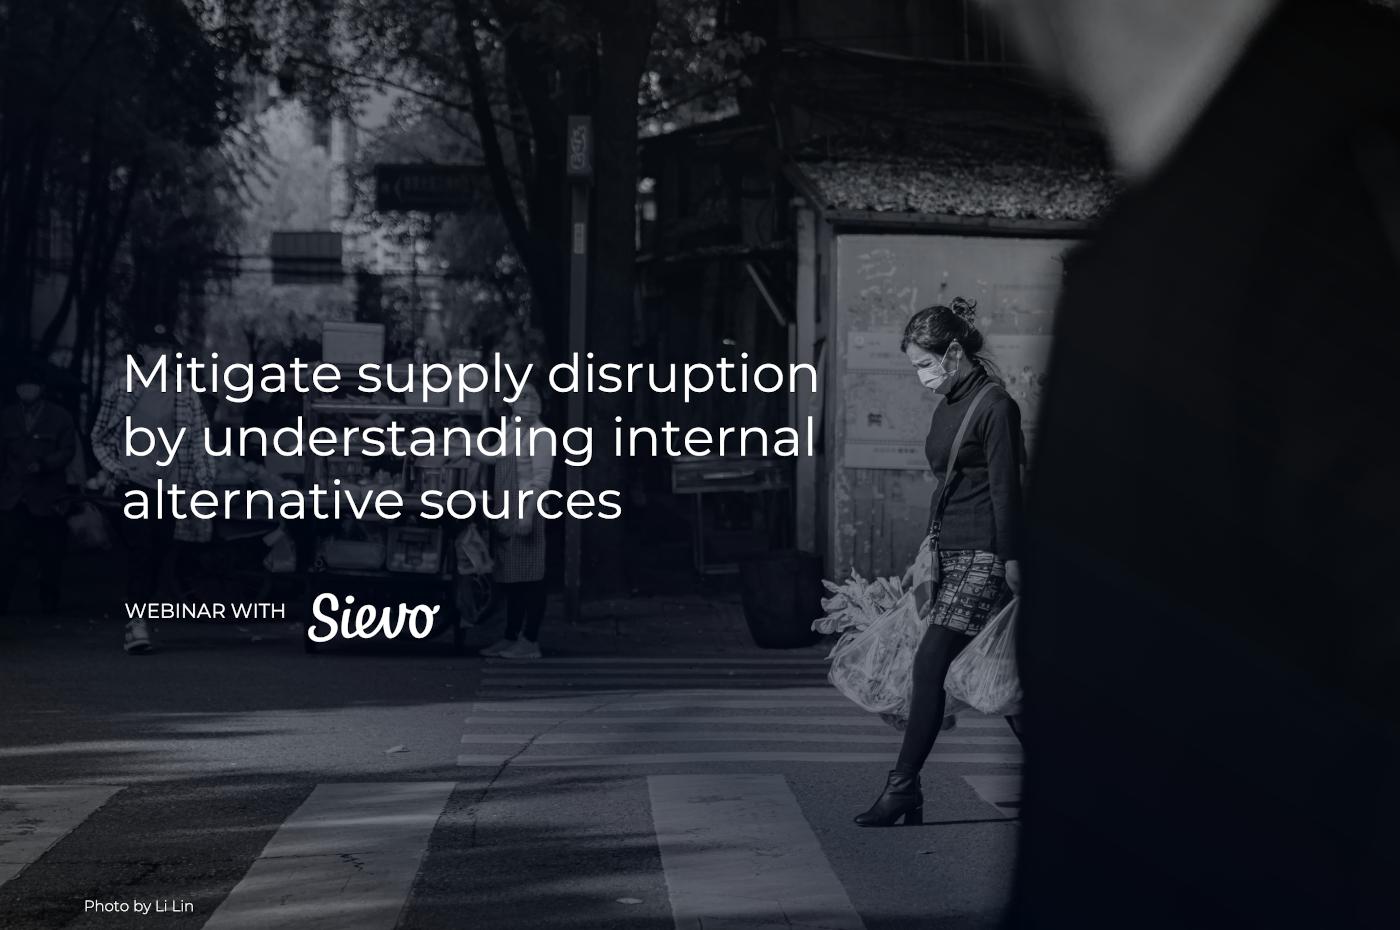 Supply disruption webinar